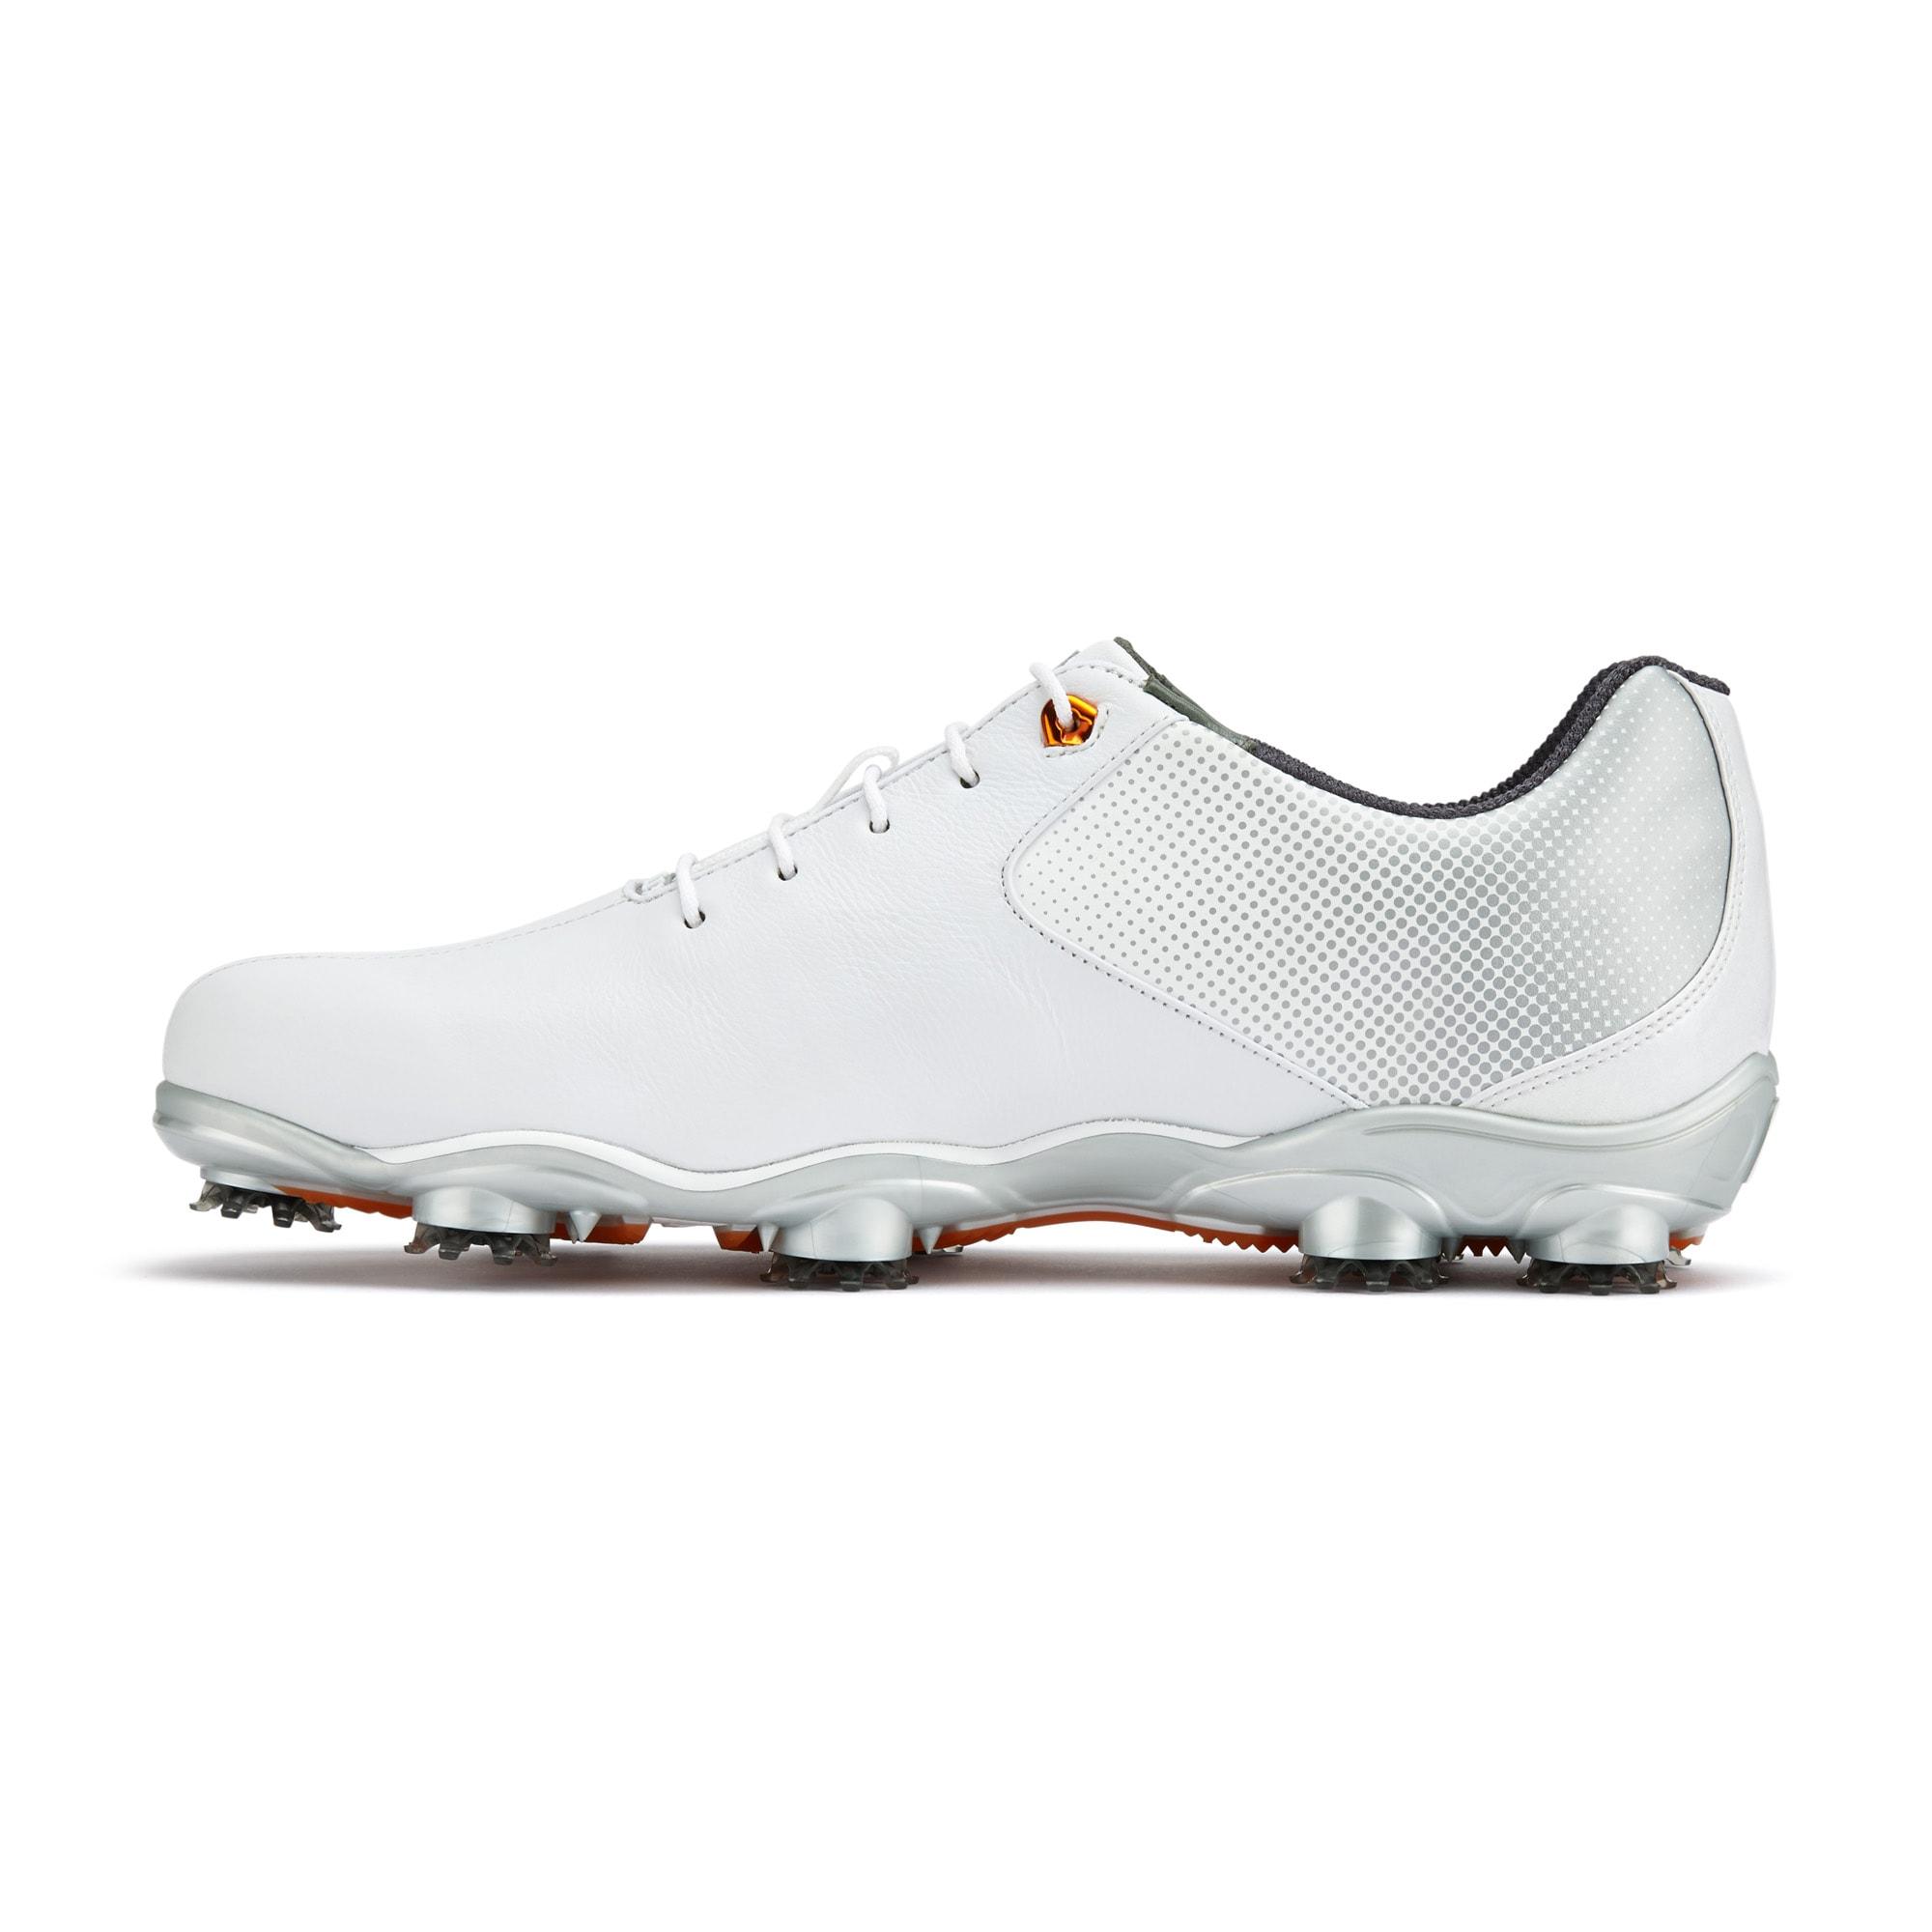 D.N.A. Helix Golf Shoes | FootJoy